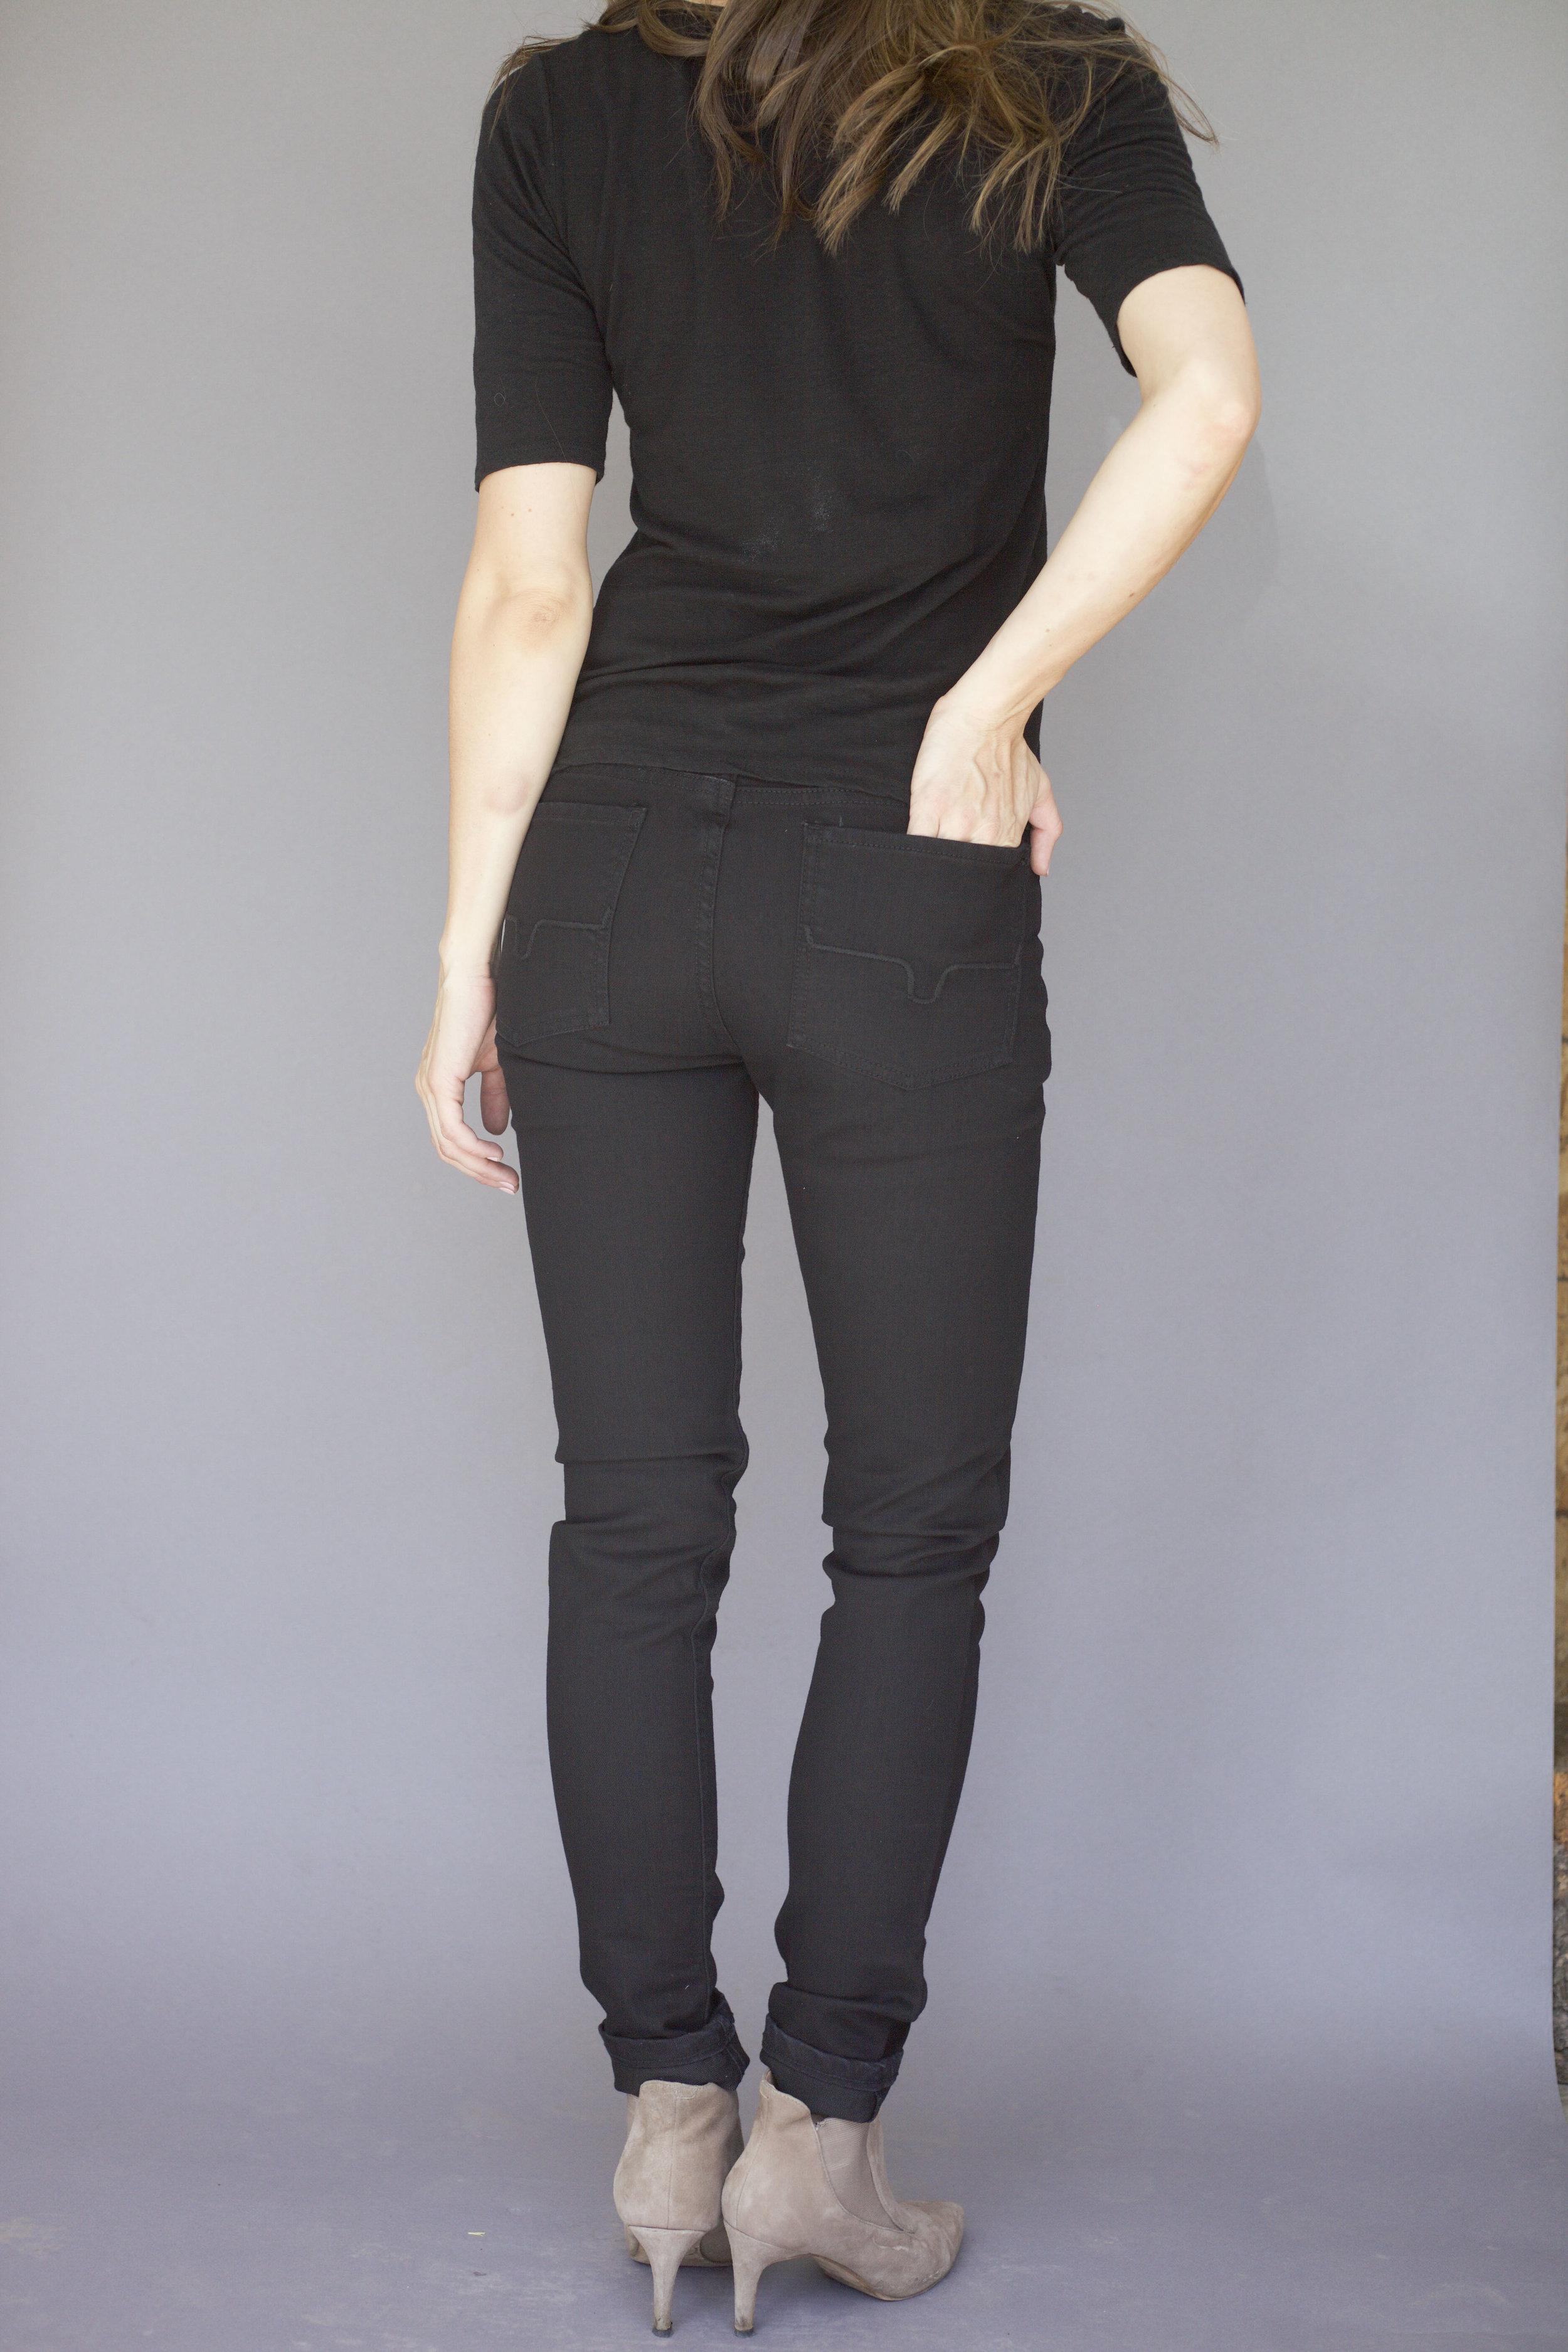 Bonnie in black